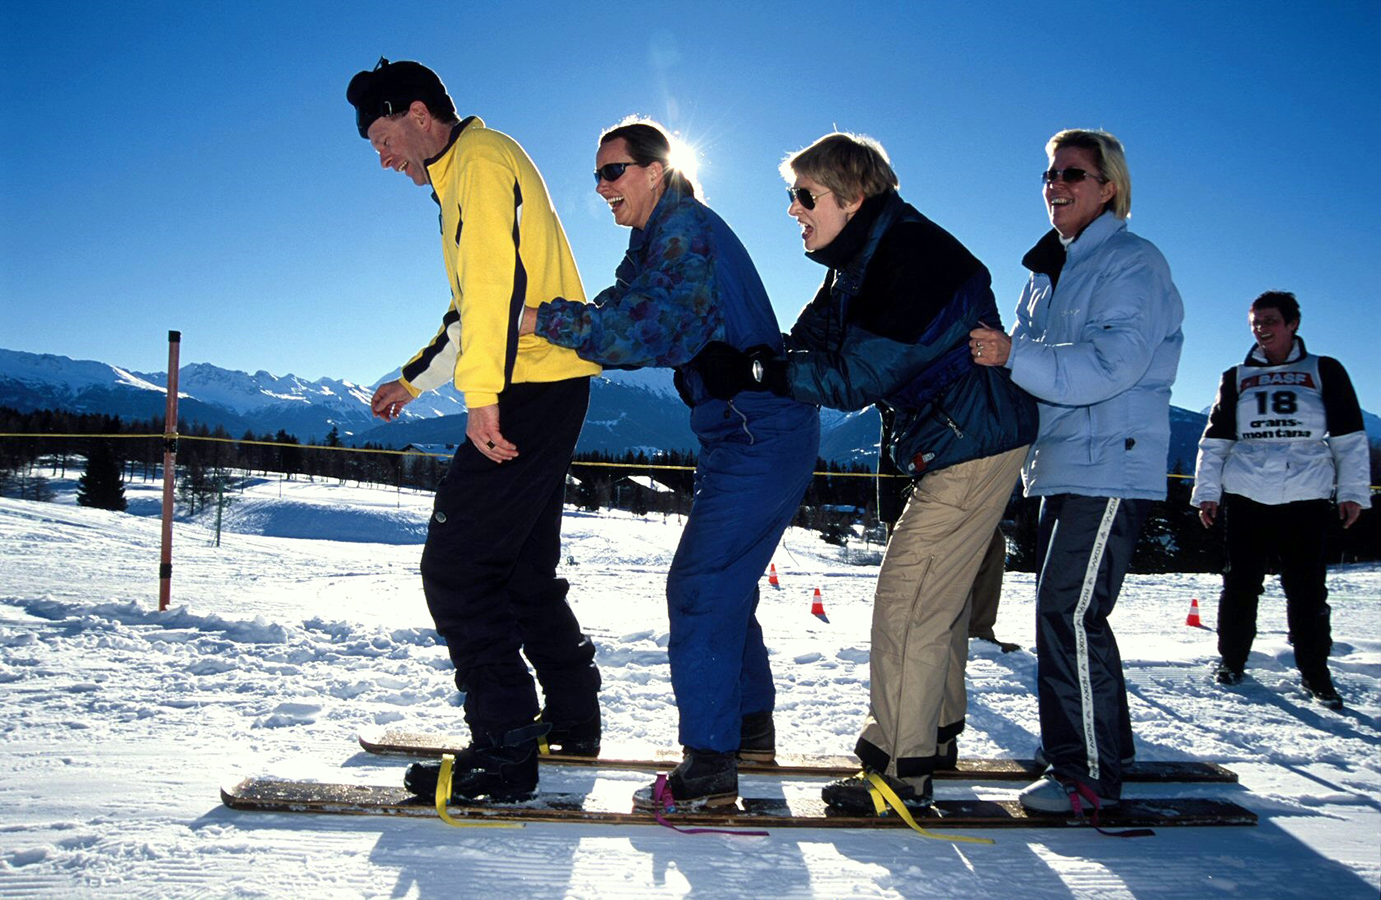 Swiss Alps Games Teambuilding Activities Events4teams